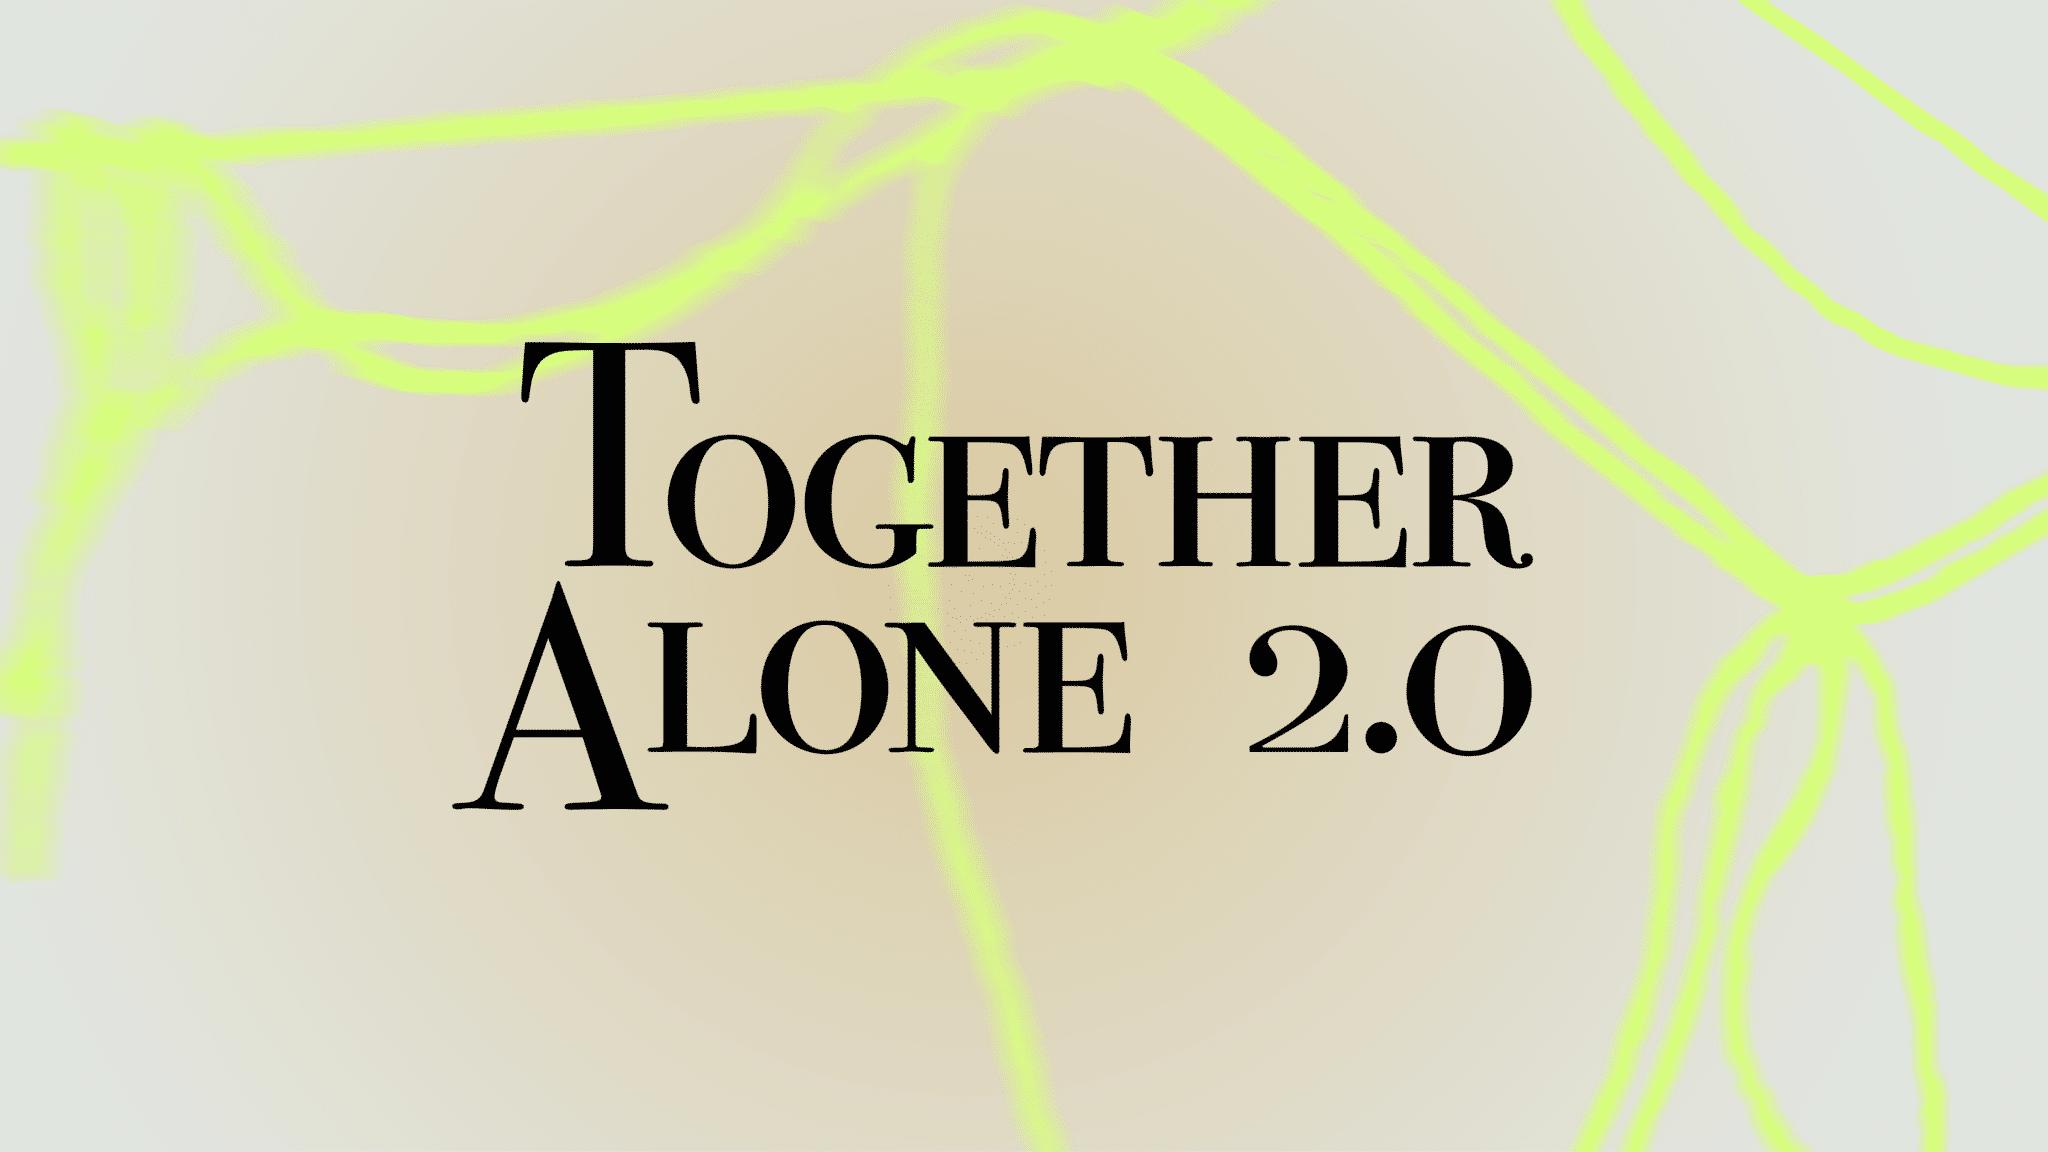 Together Alone 2.0